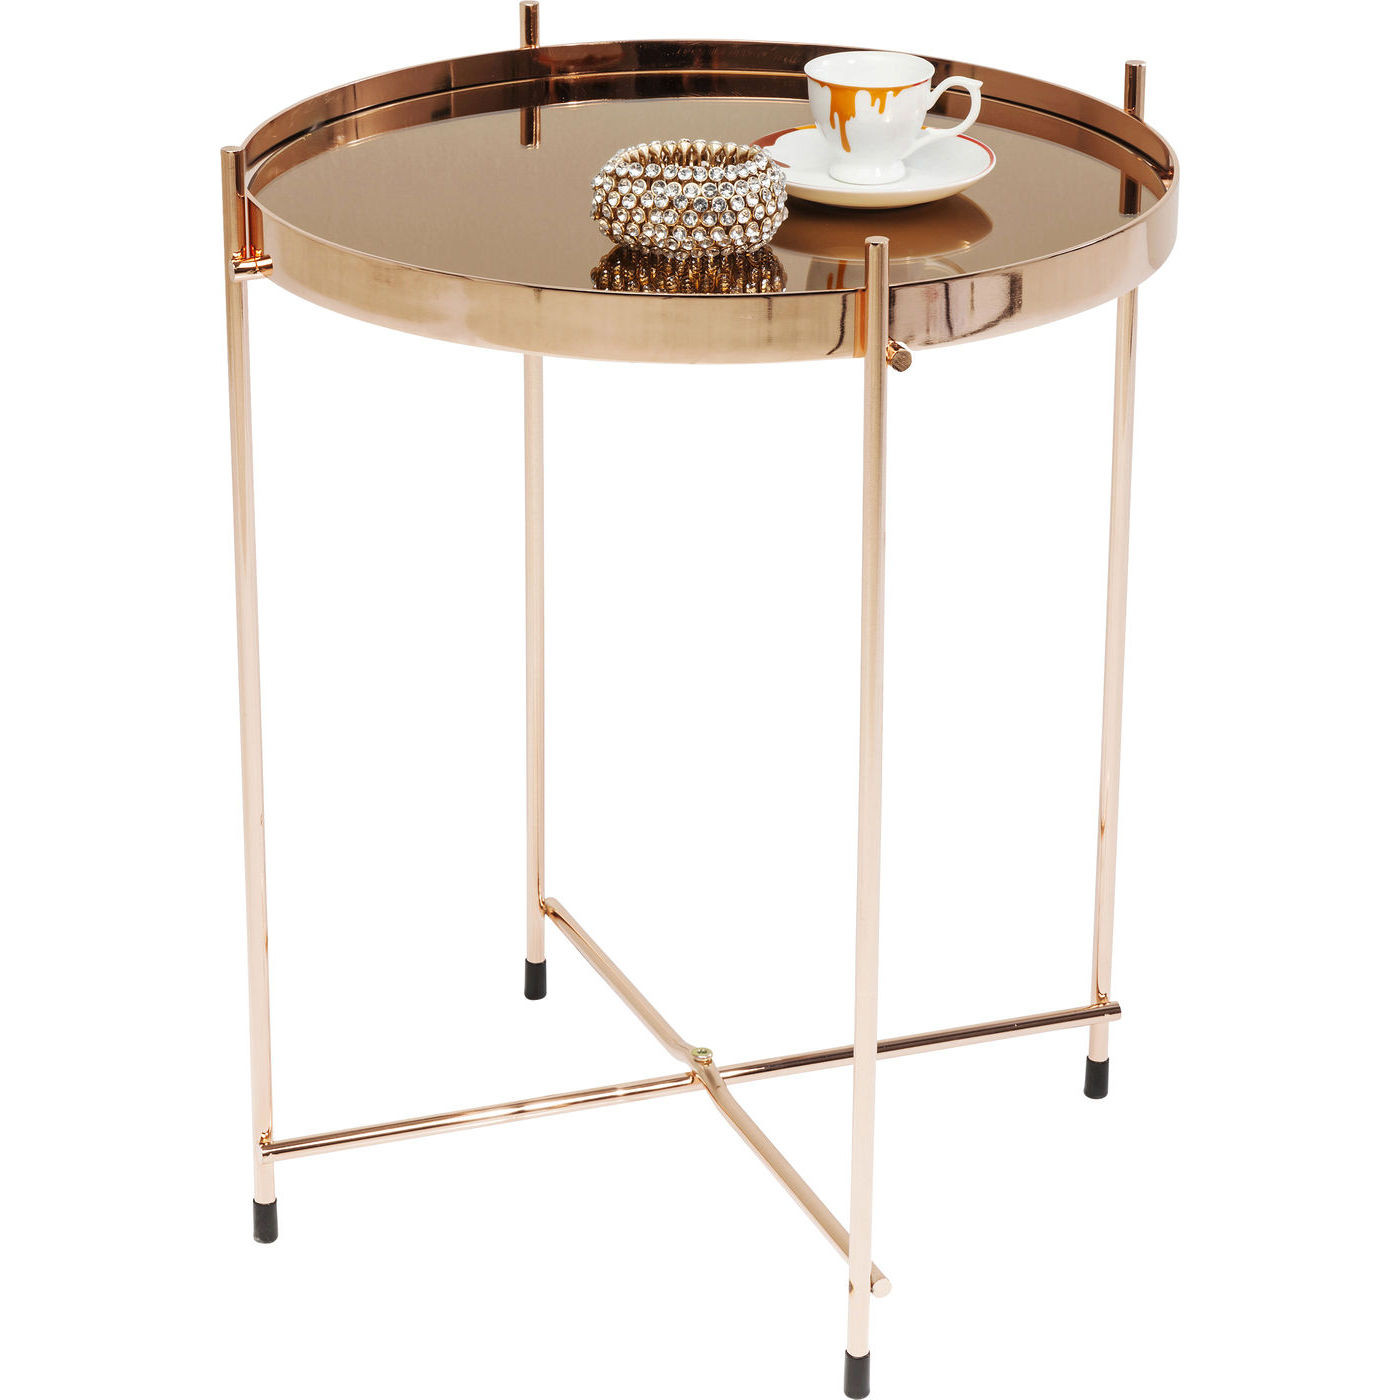 beistelltisch miami rosegold 42cm kare design mutoni m bel. Black Bedroom Furniture Sets. Home Design Ideas